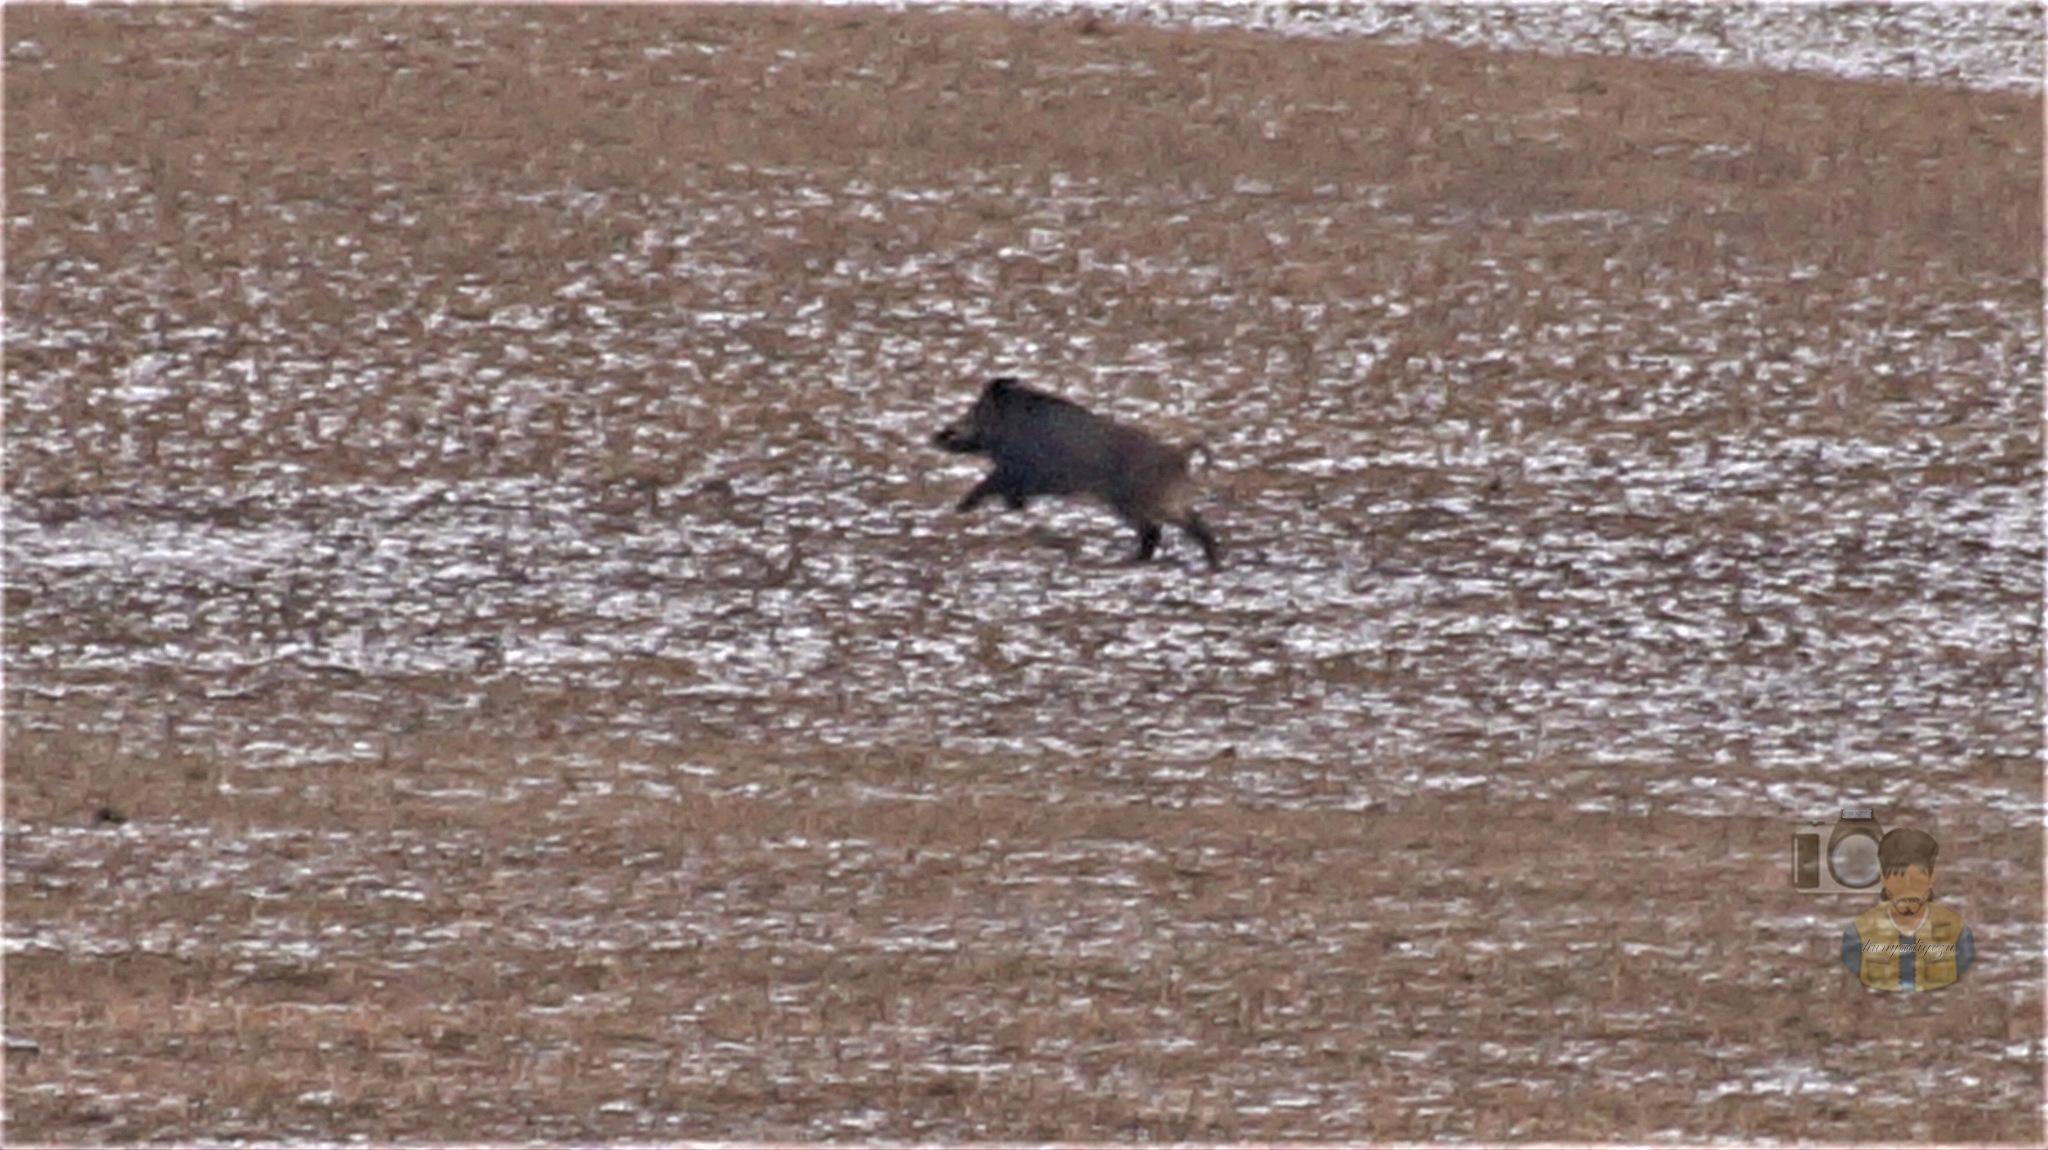 January 26, today, wild boar run on snowy meadow by hunyadigeza